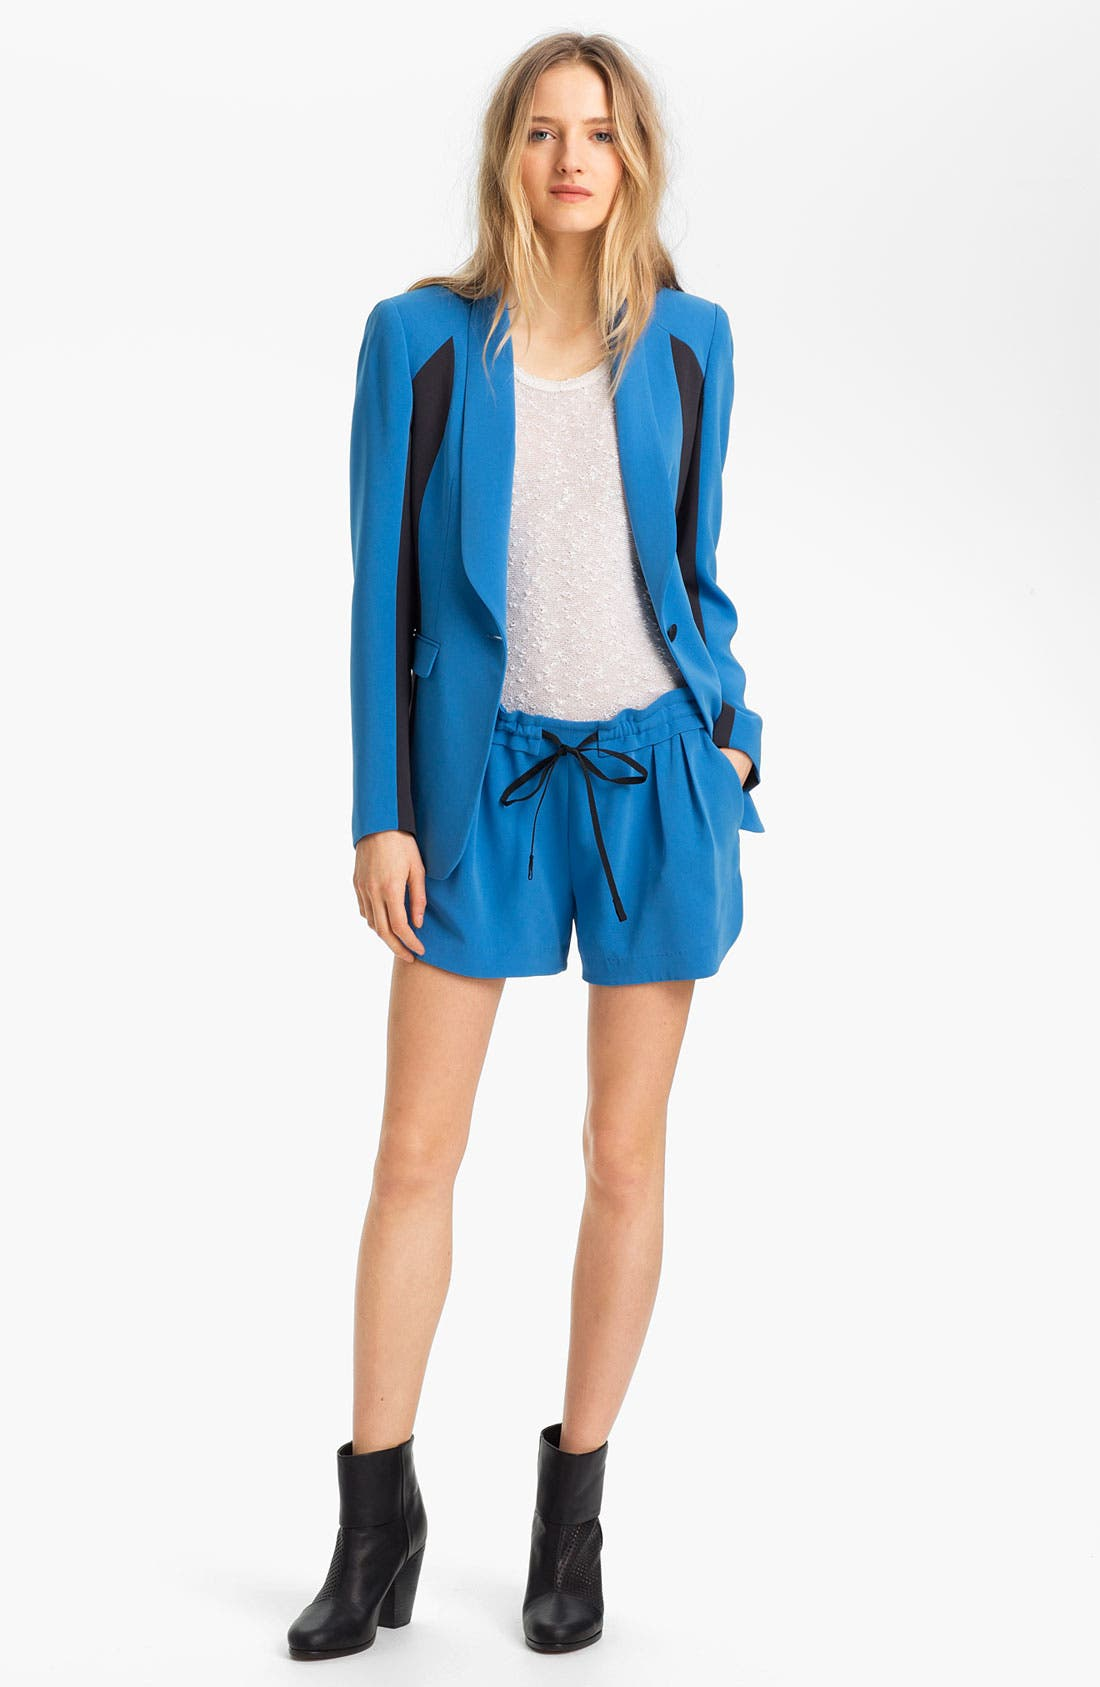 Alternate Image 1 Selected - rag & bone/JEAN 'Jefferson' Contrast Panel Blazer